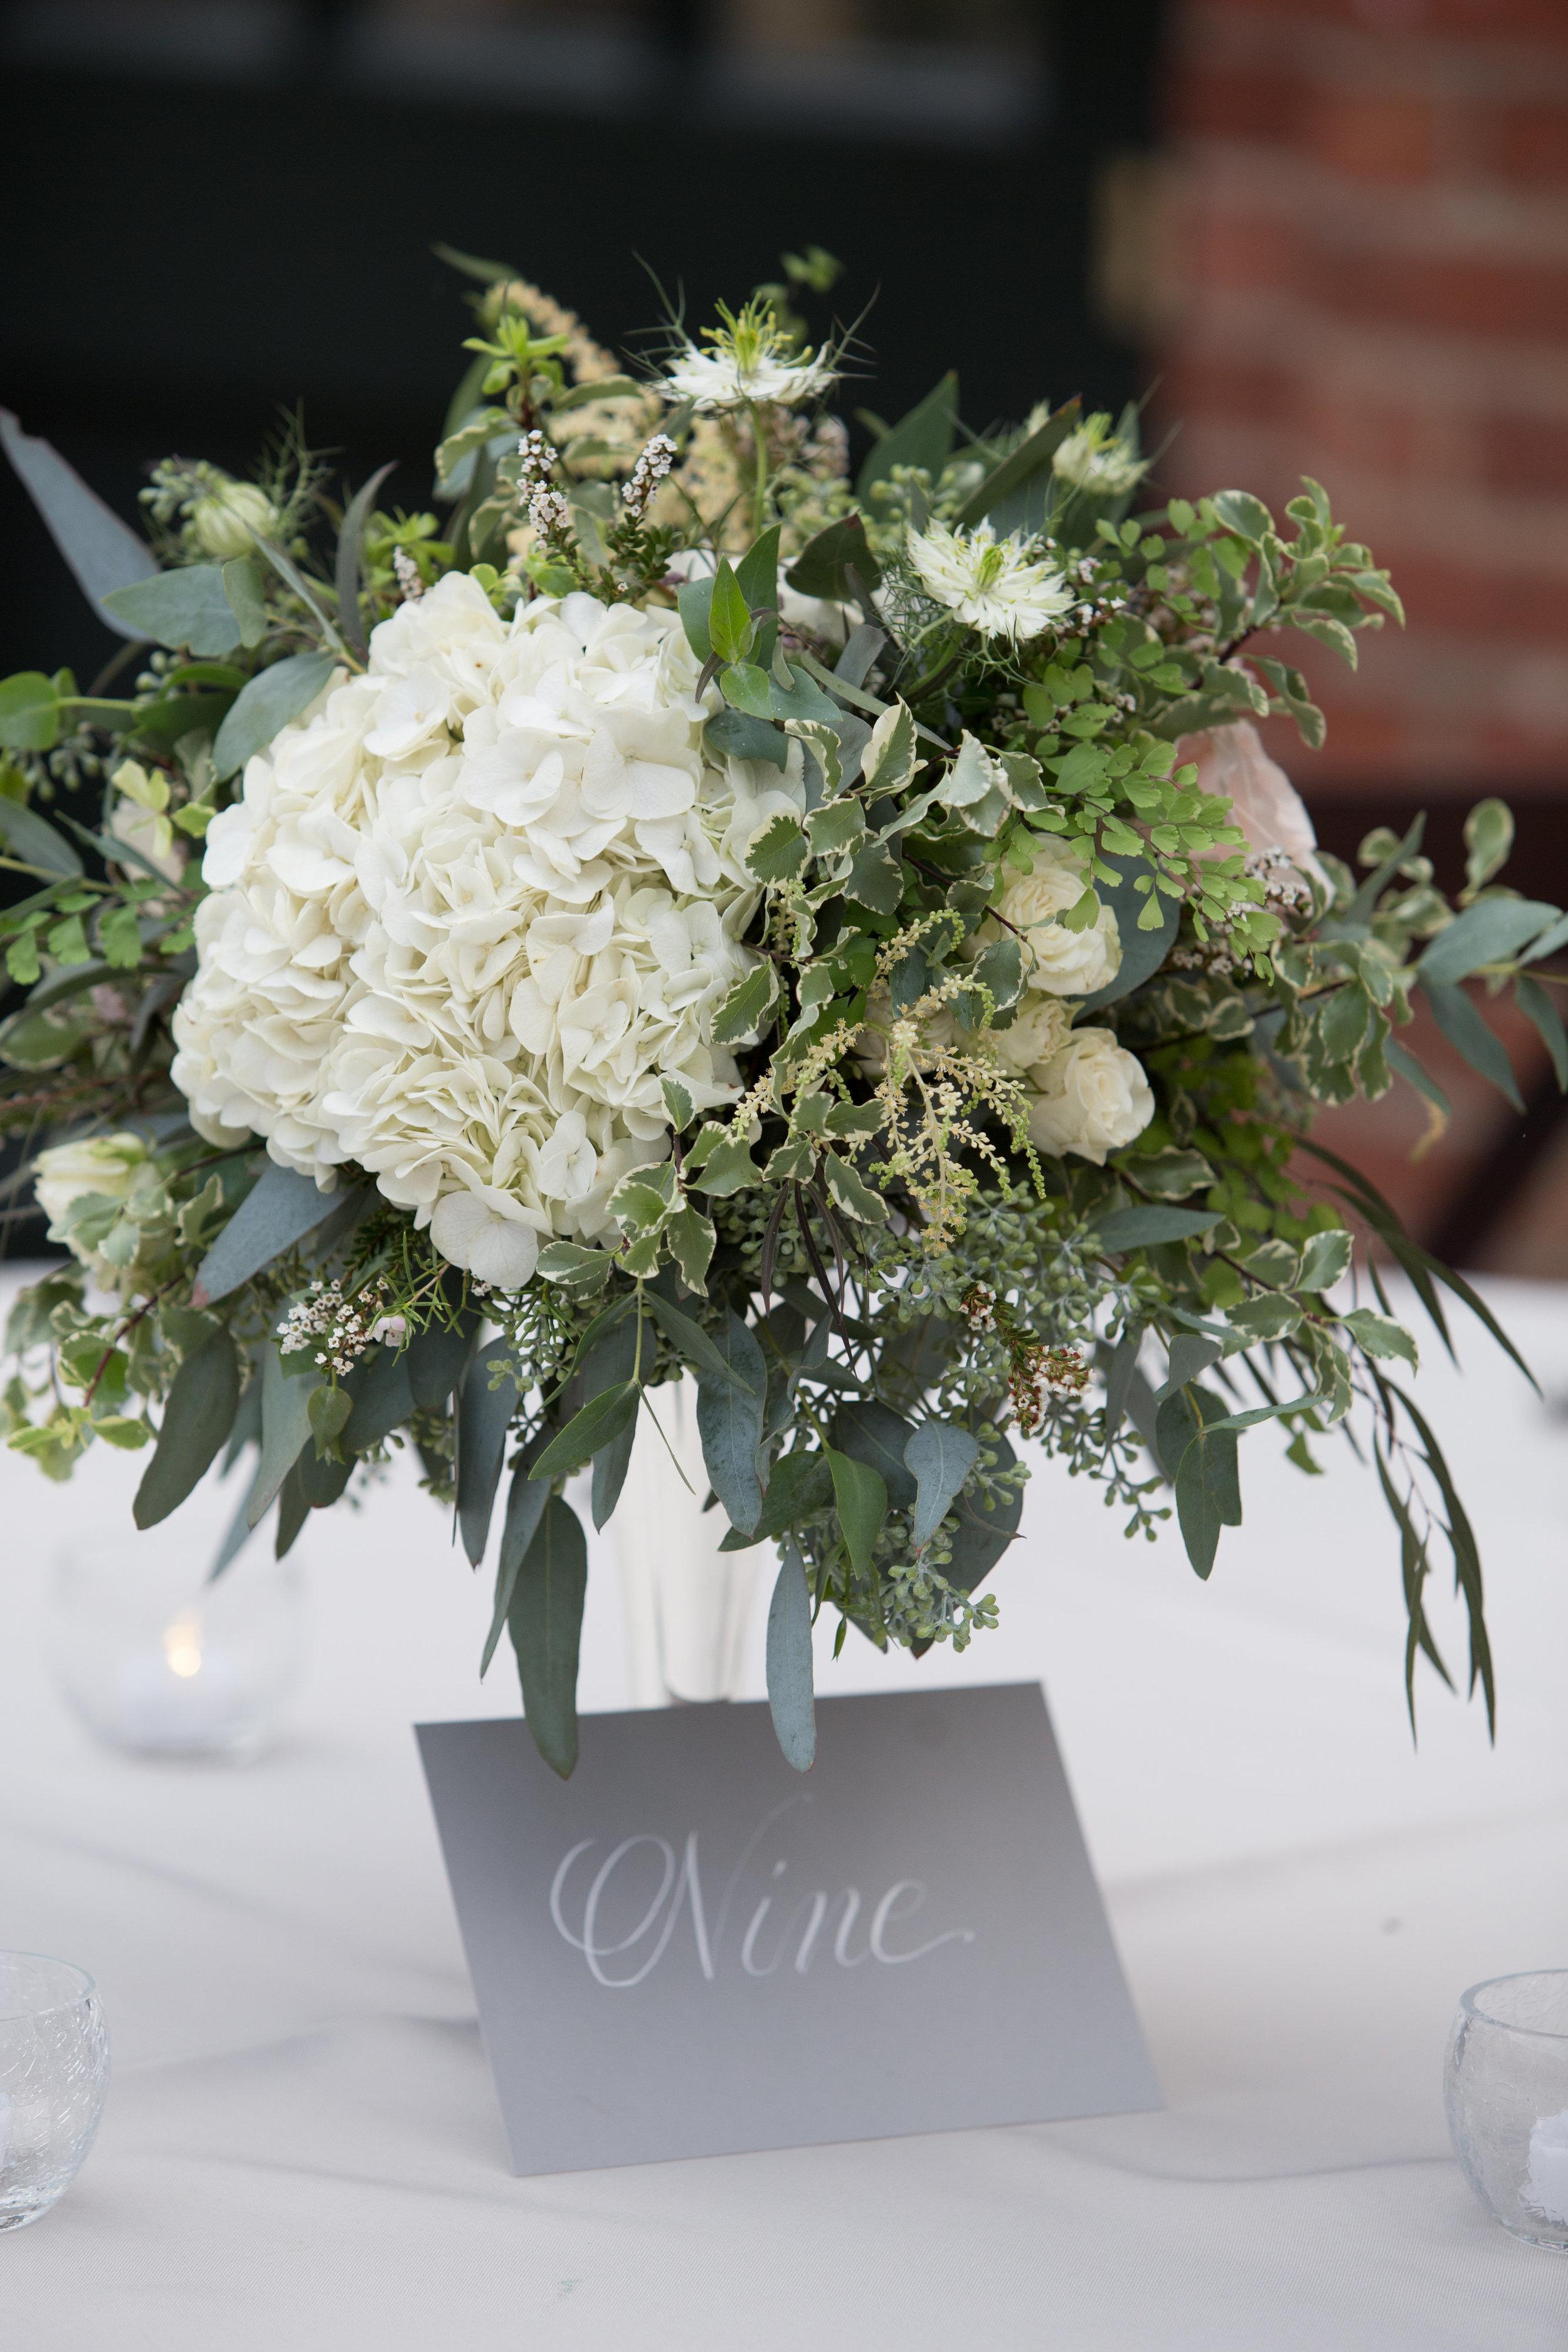 Hydrangea, garden roses, and organic greenery centerpiece